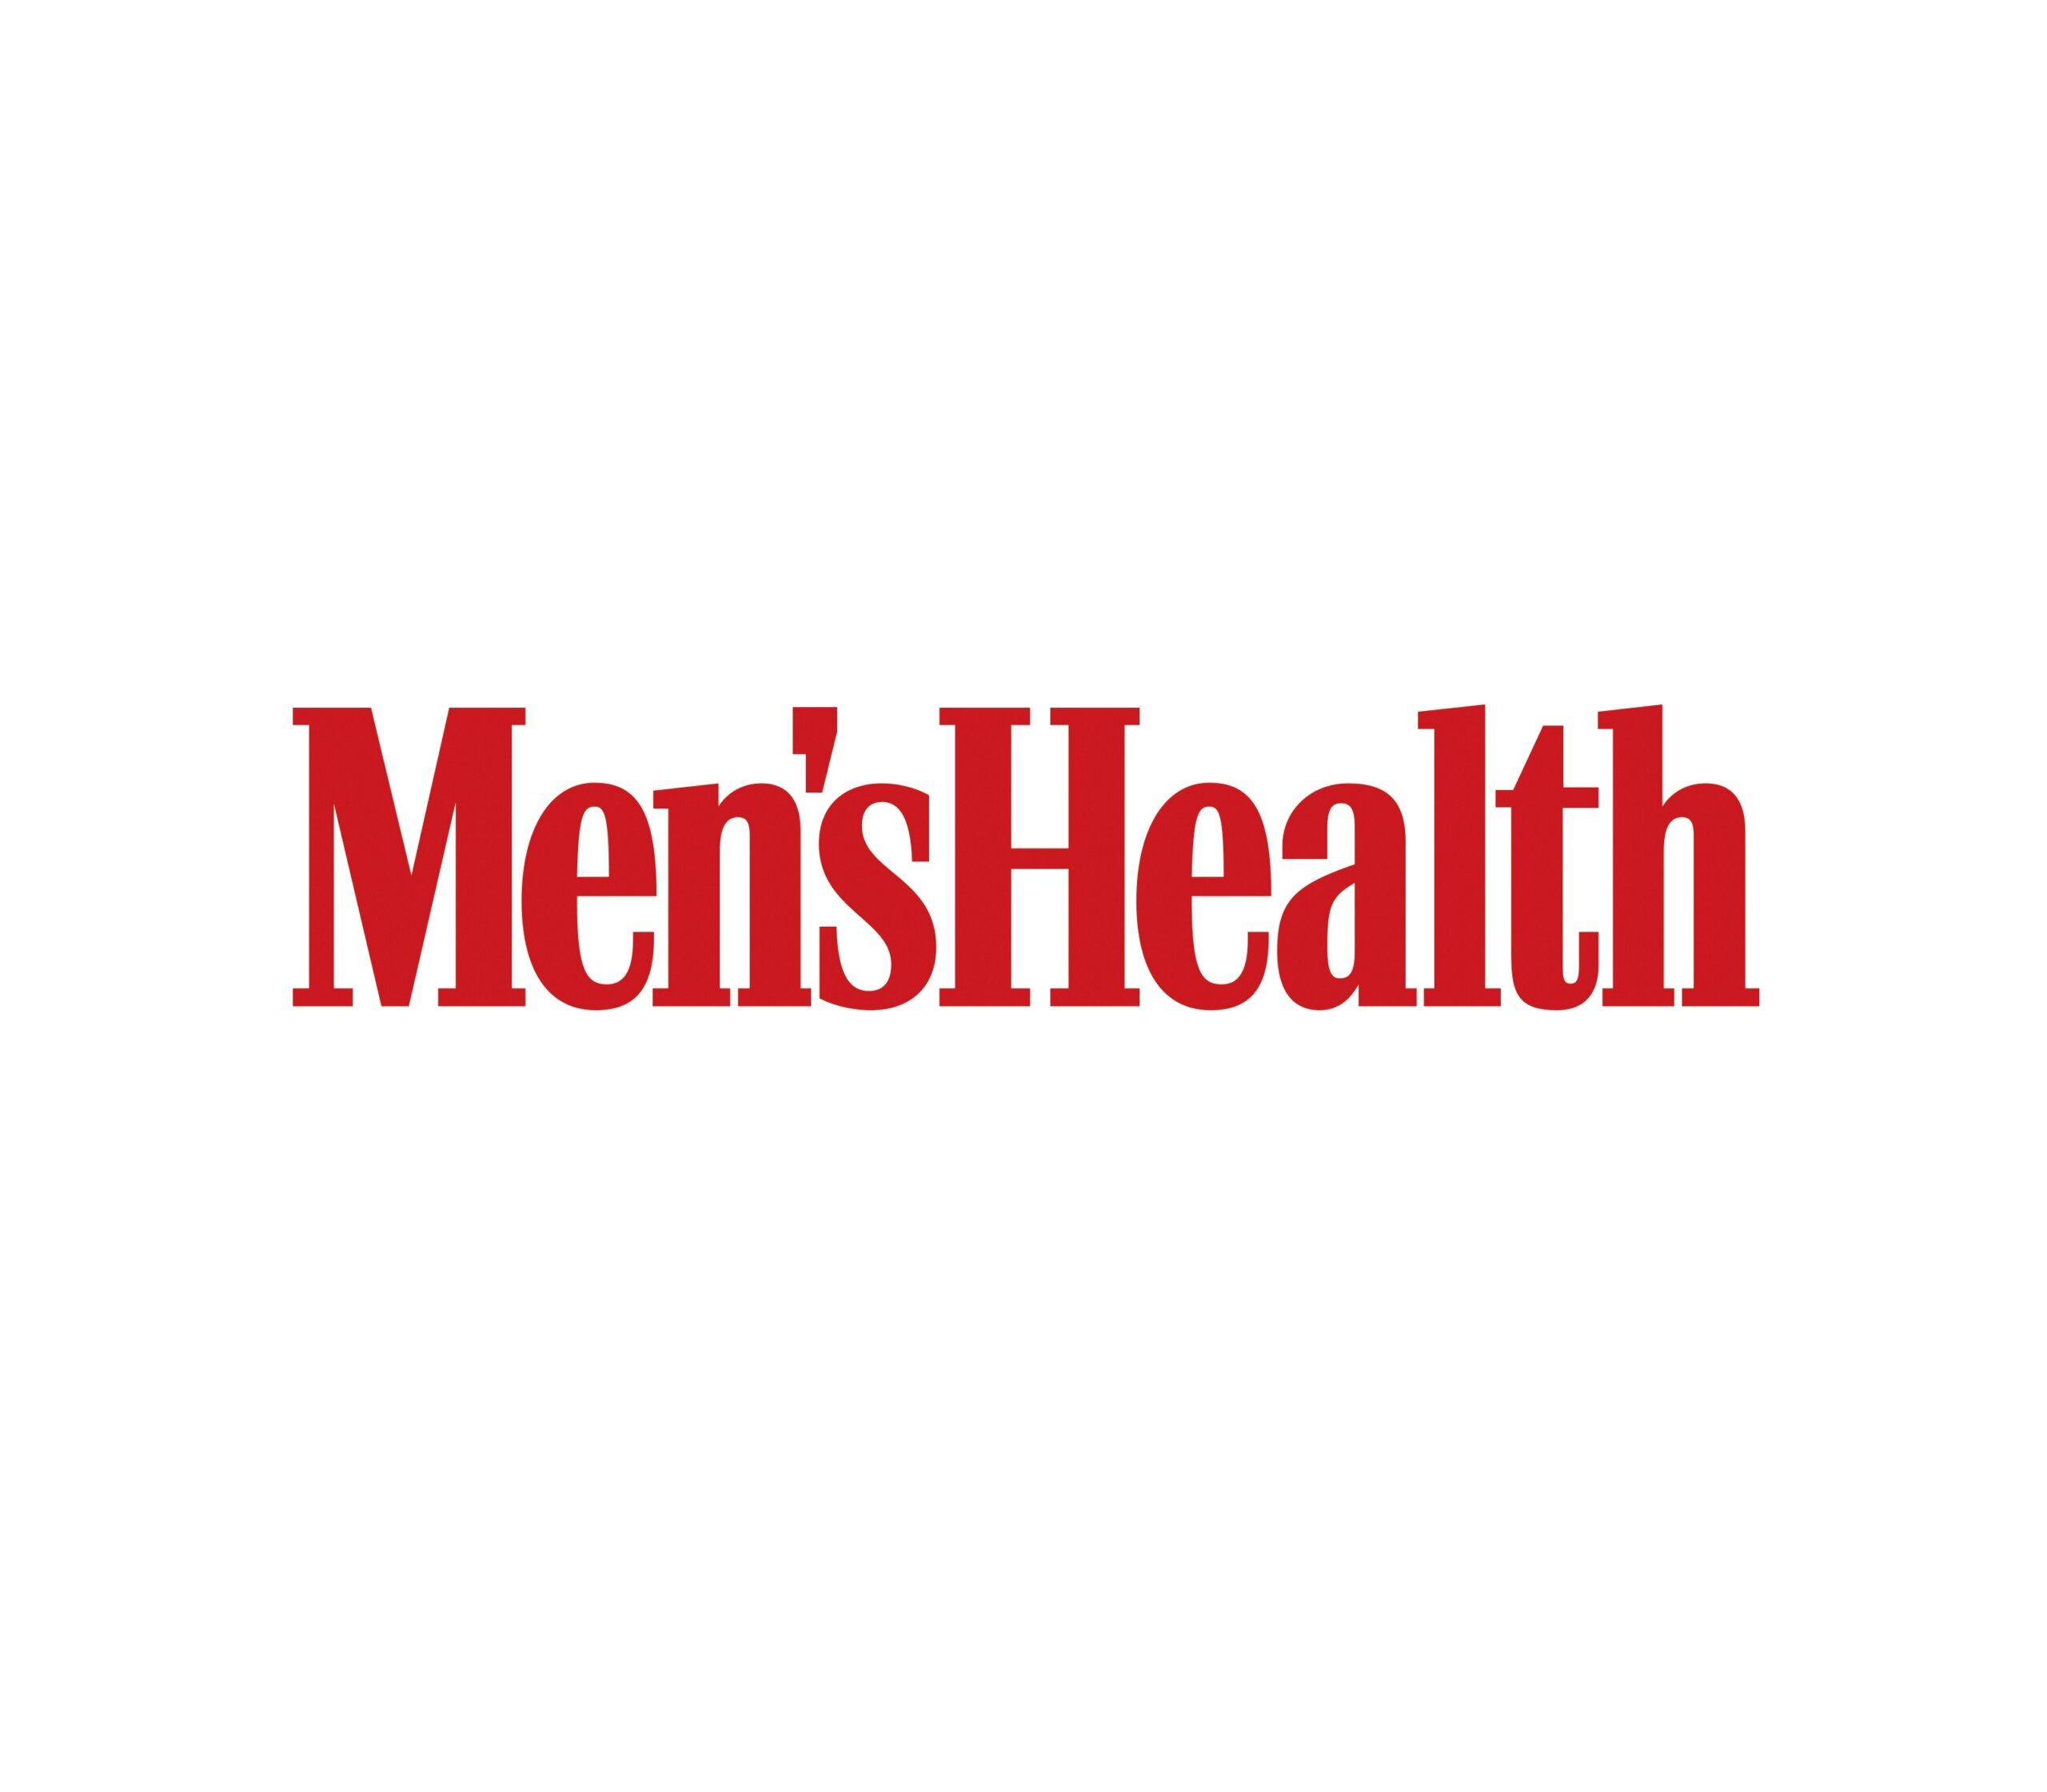 Men's Health Patronem Medialnym Festiwalu